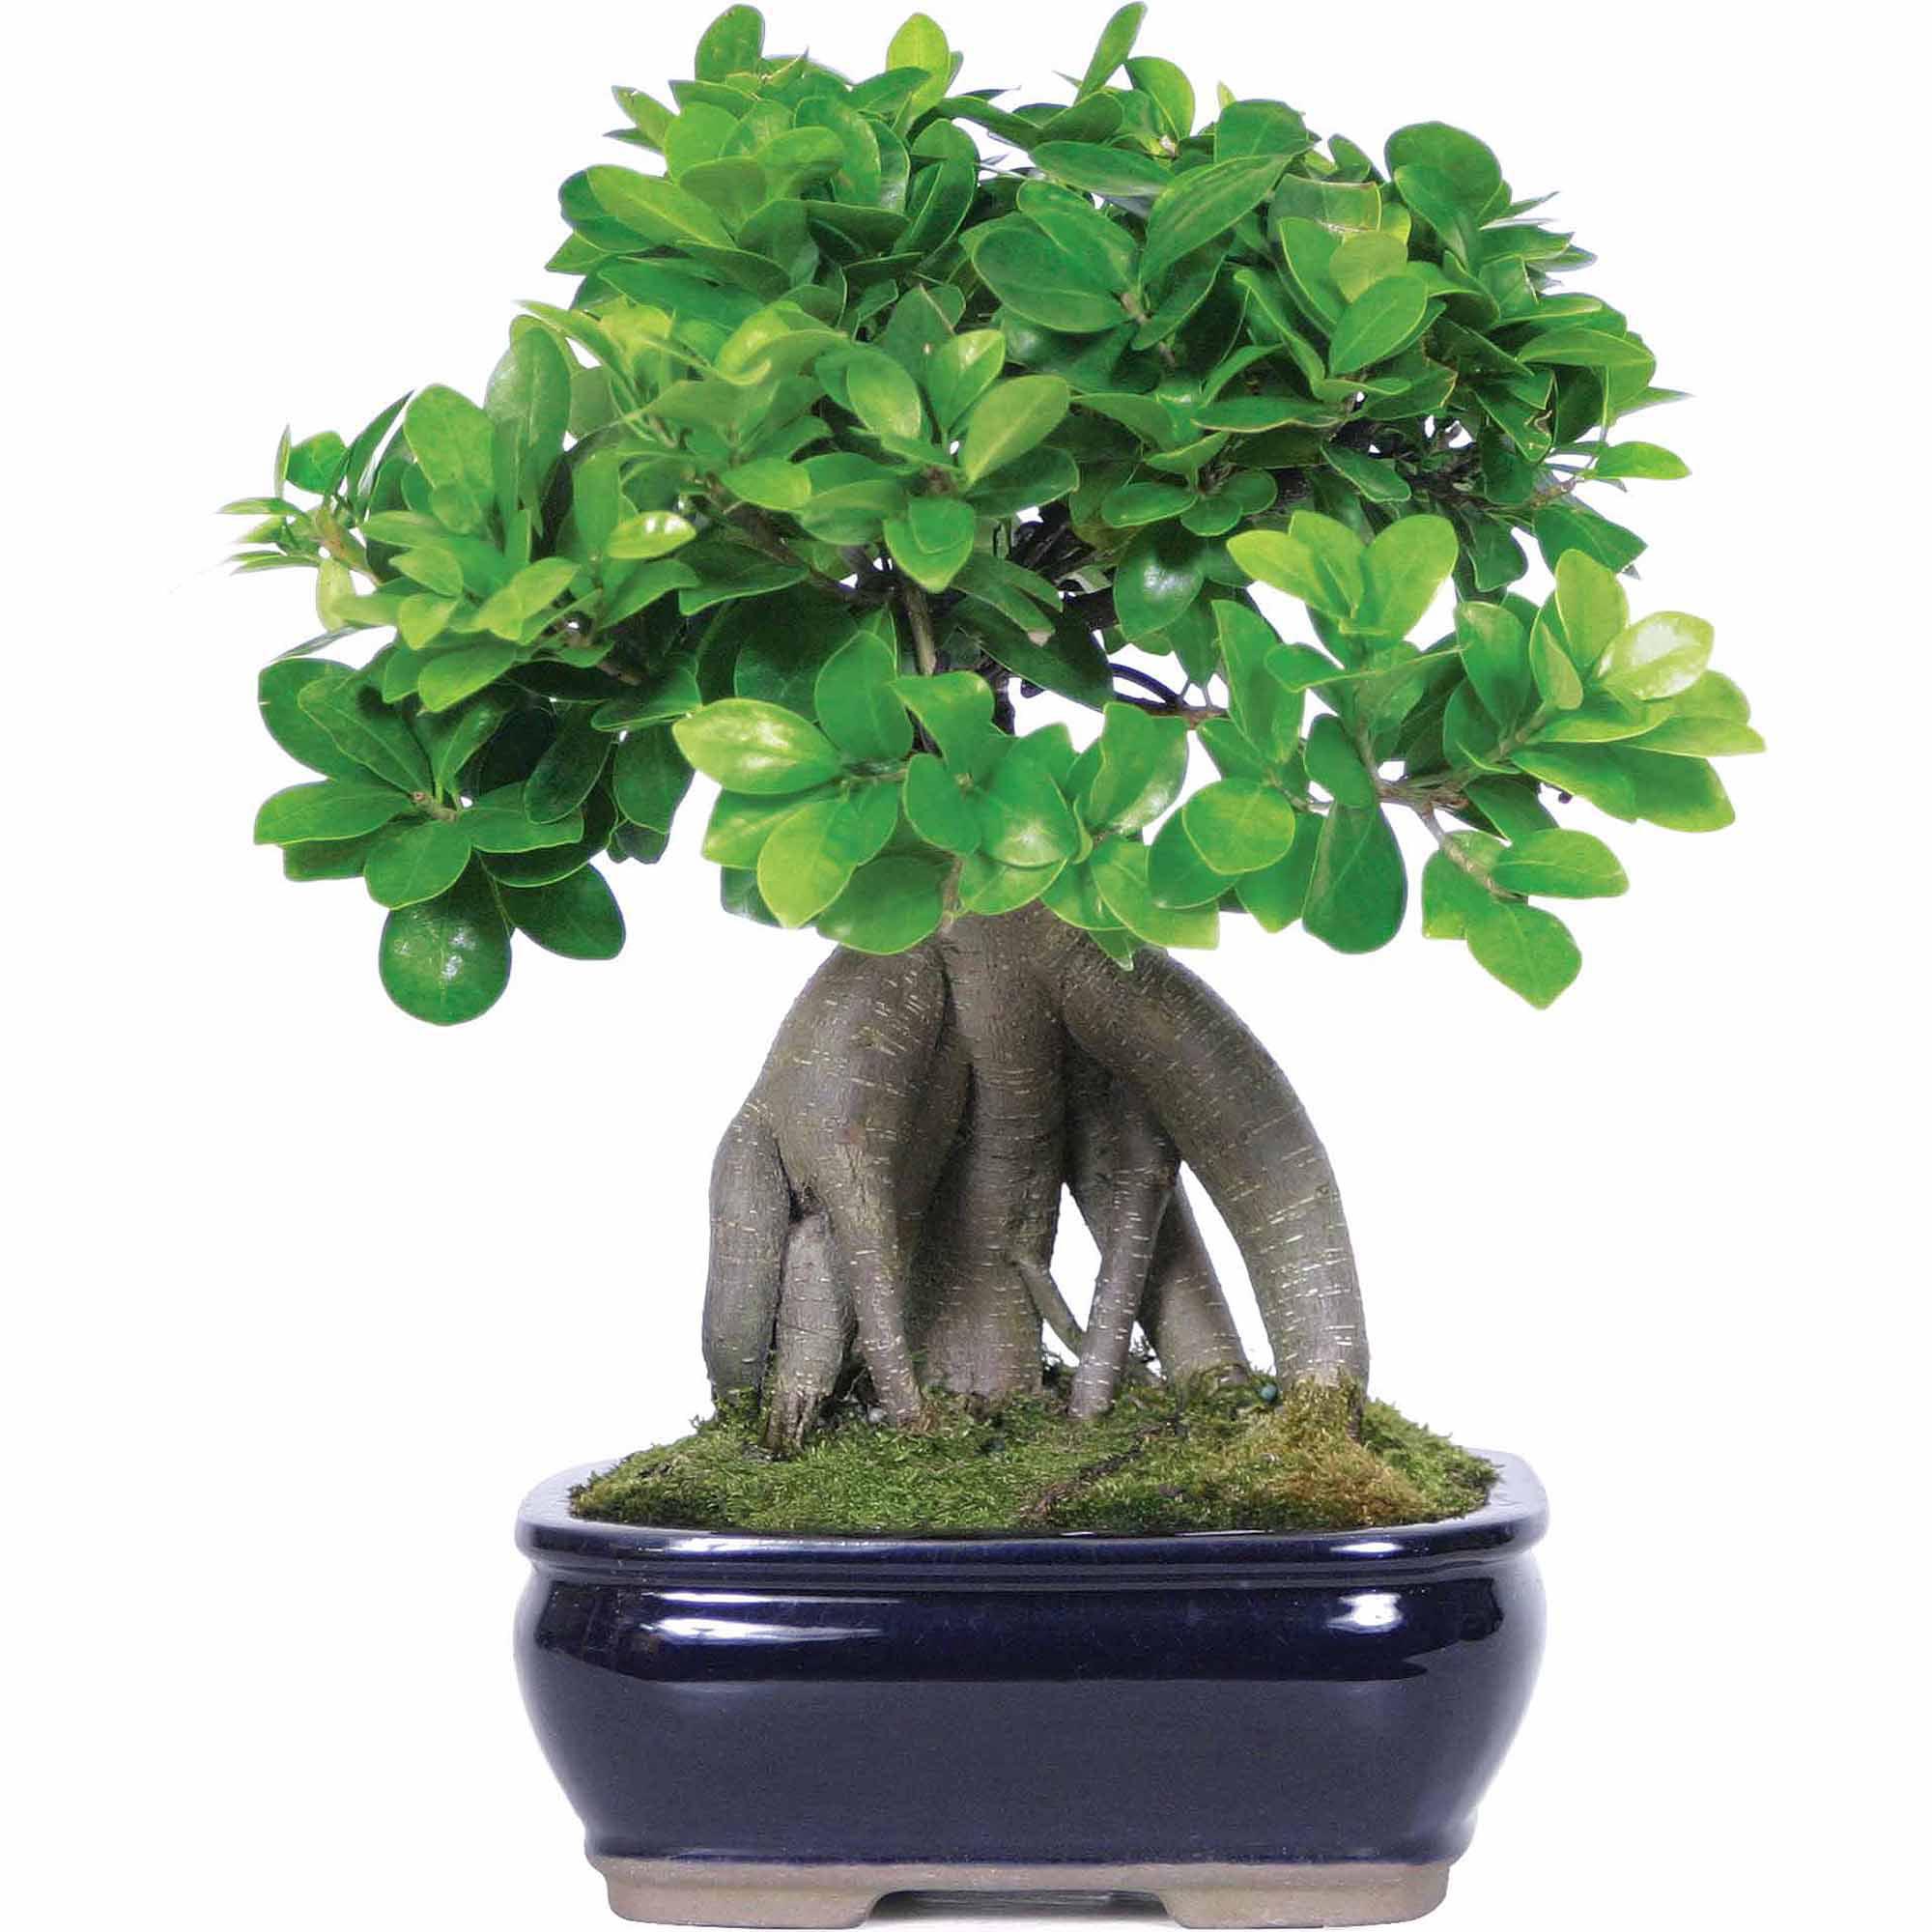 Ginseng Grafted Ficus Bonsai Tree - Walmart.com